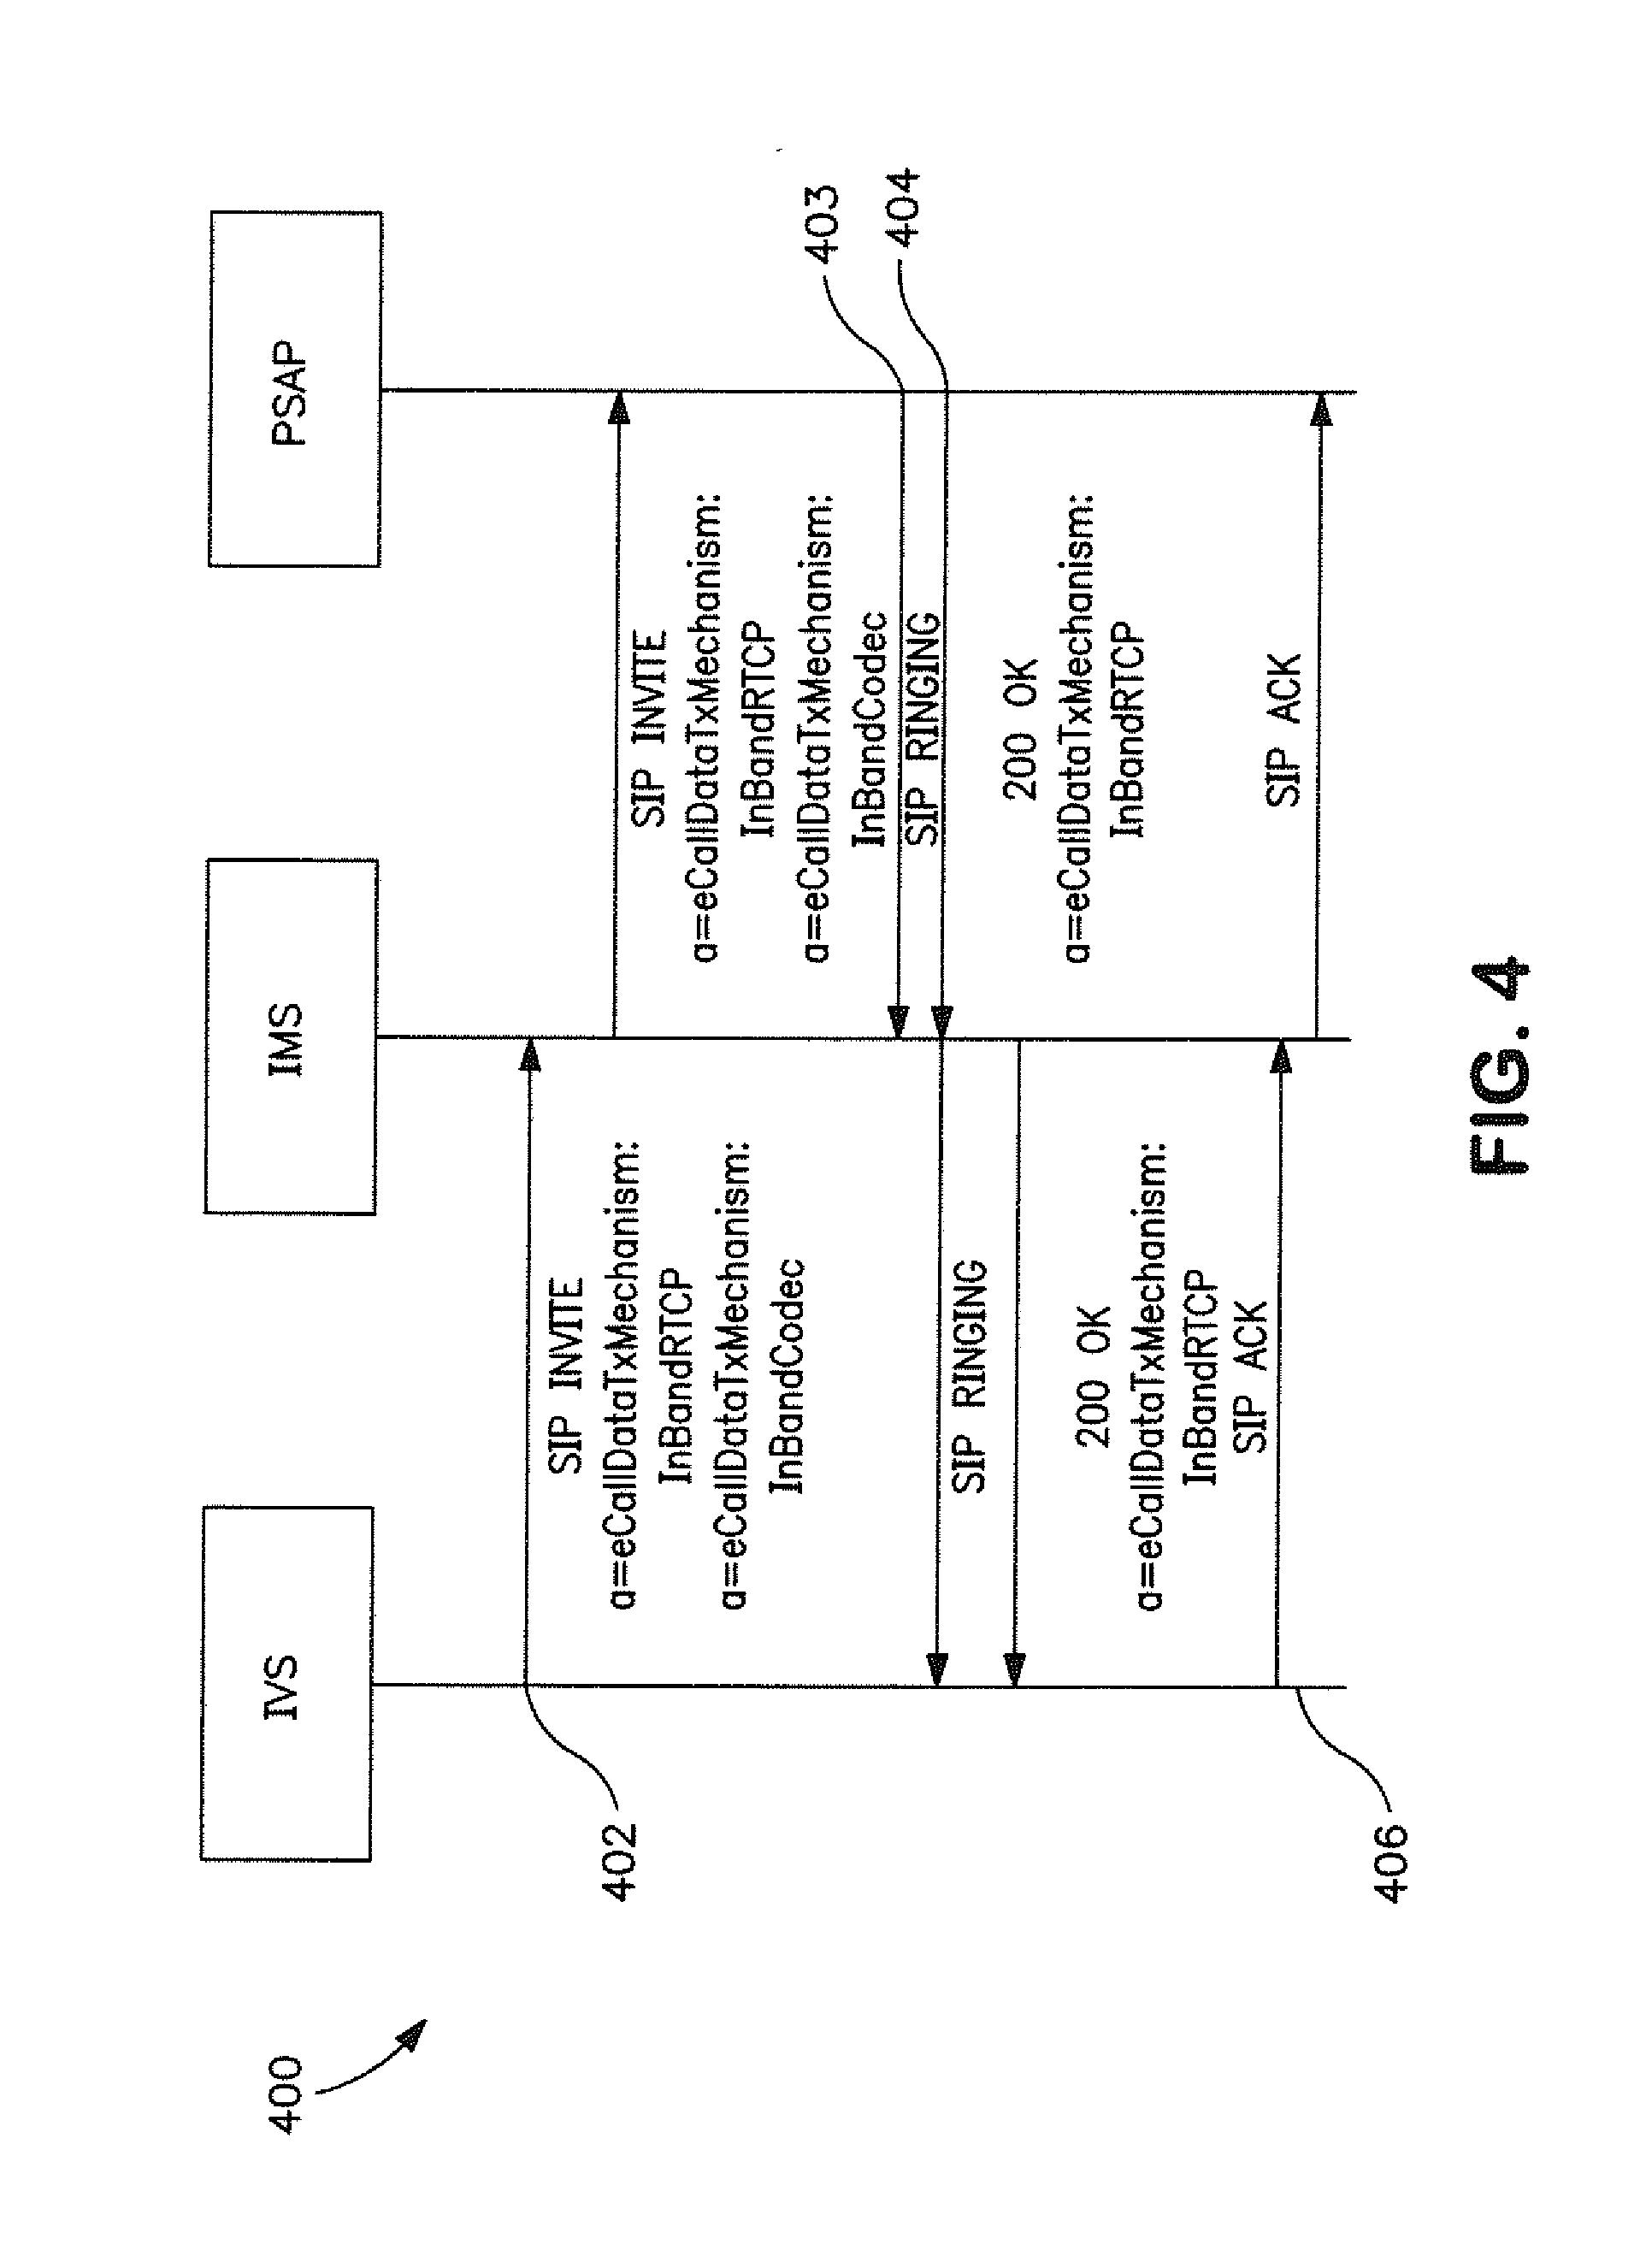 imca msd wiring diagram